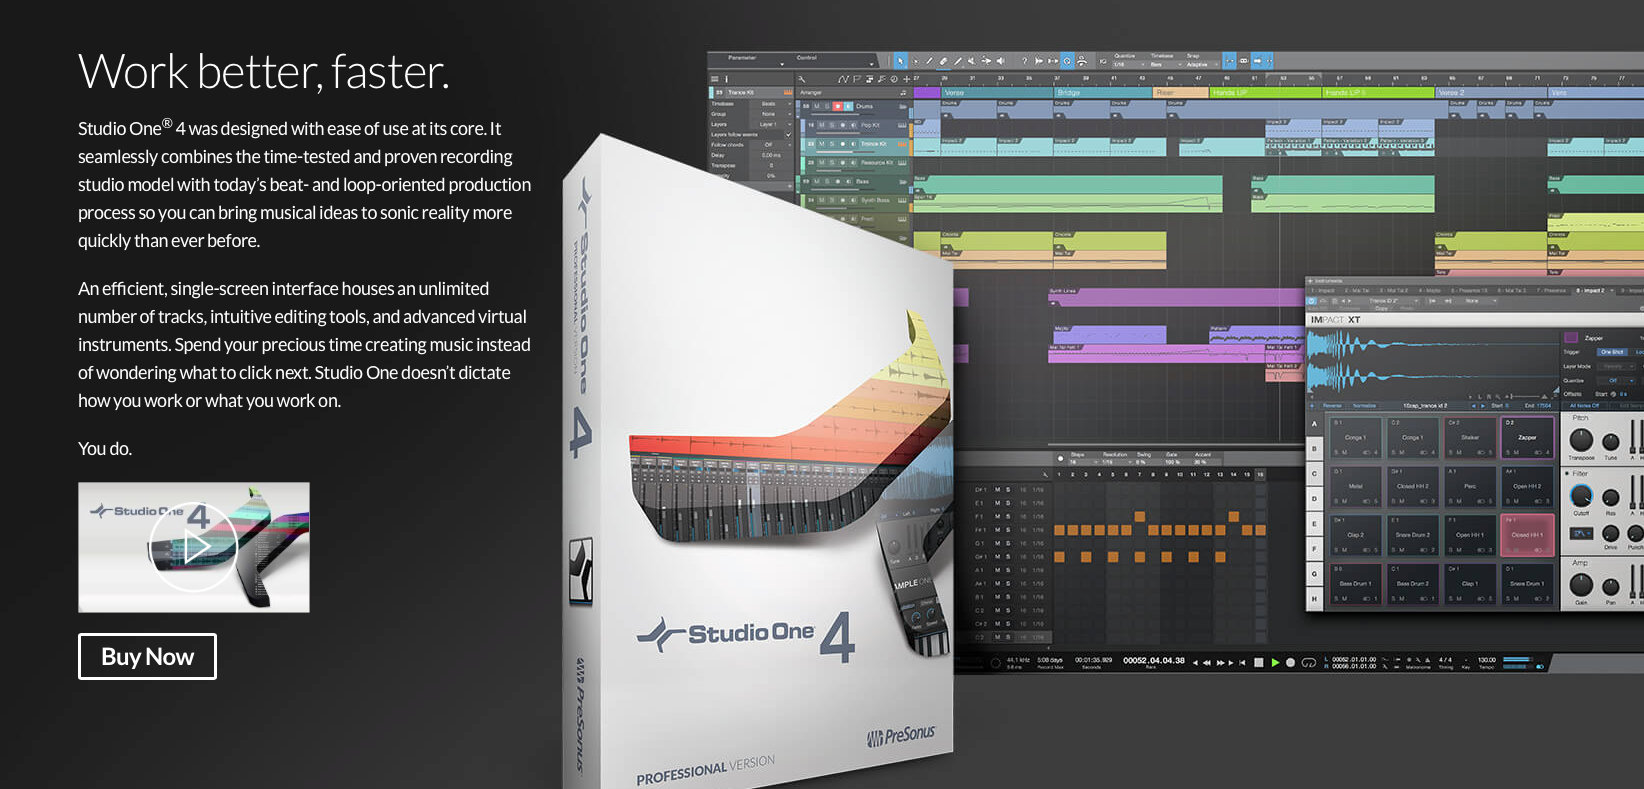 PreSonus Studio One 4 專業錄音編曲軟體